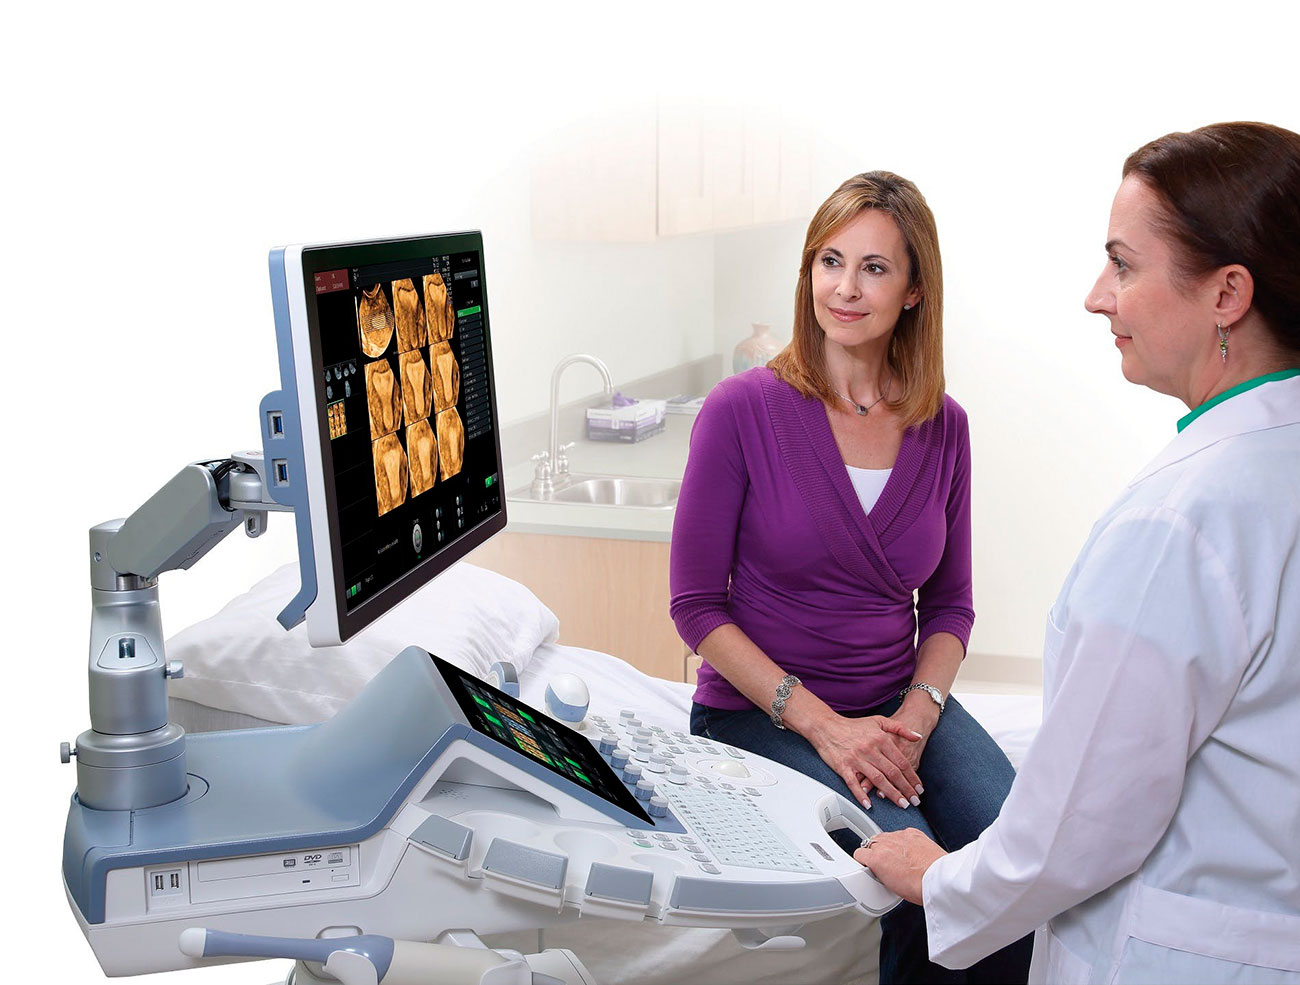 Кокки в мазке: норма и патология, свойства, симптоматика, диагностика, как лечить